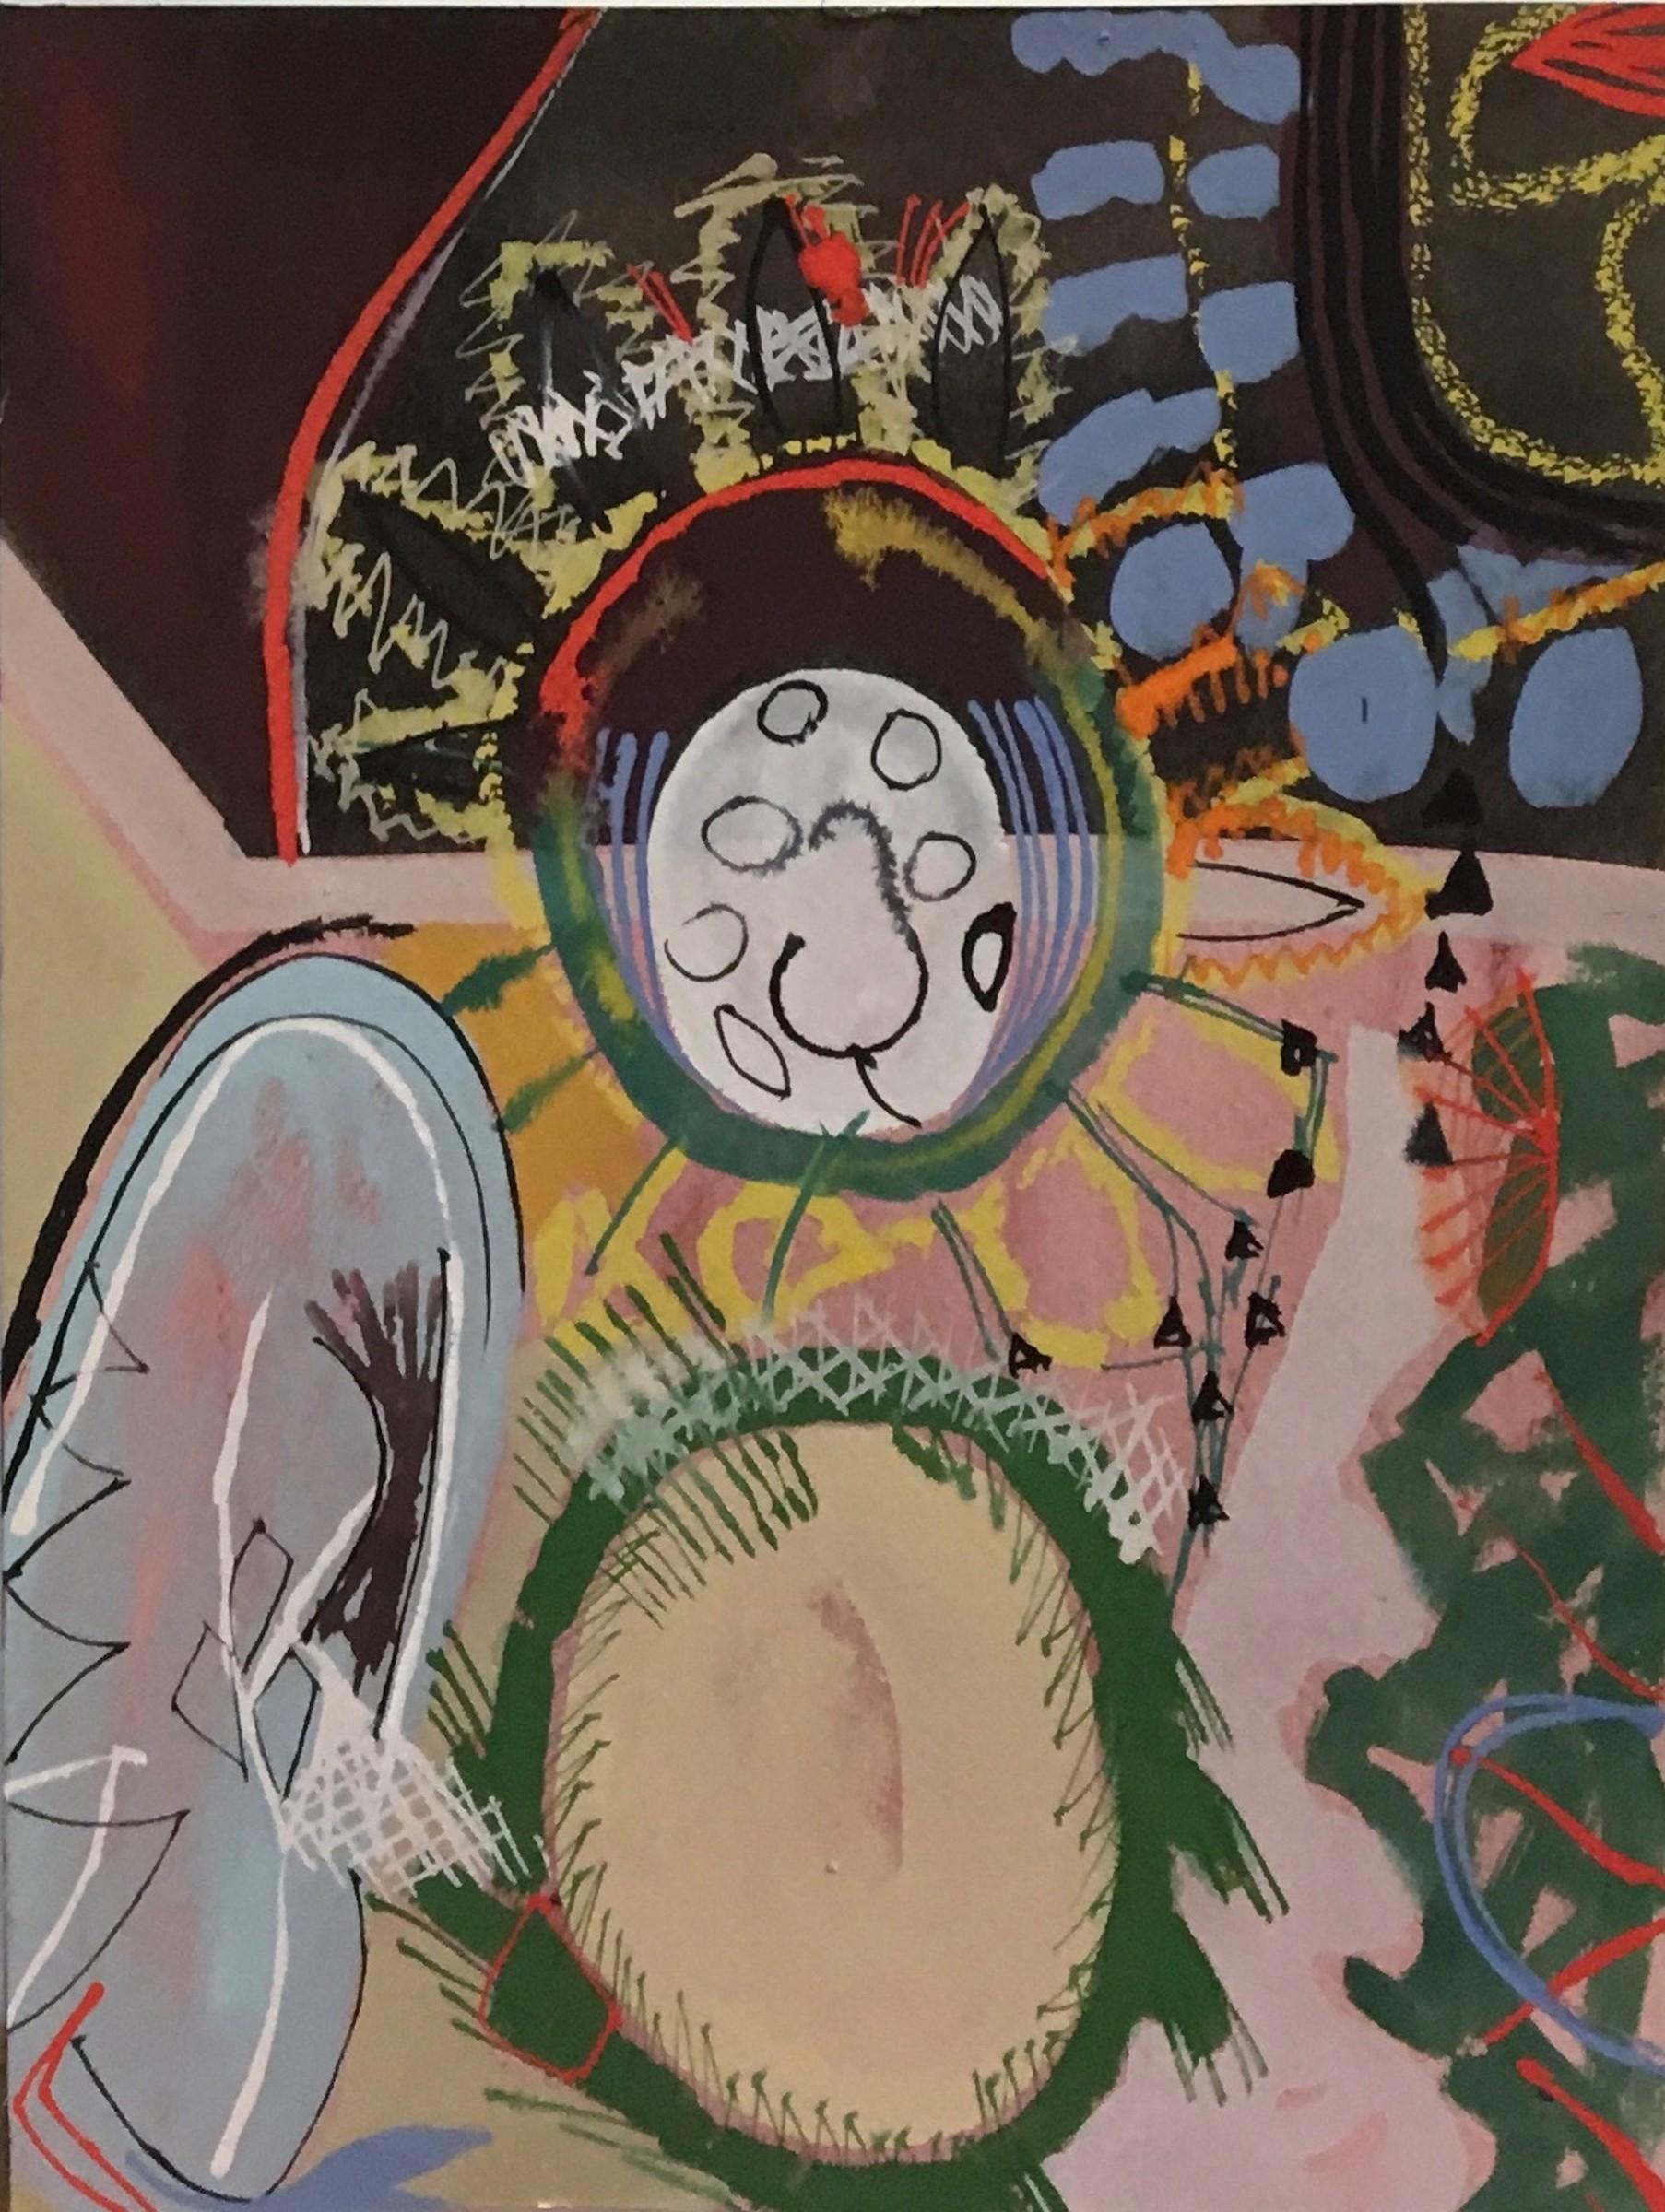 "<span class=""link fancybox-details-link""><a href=""/artists/170-chloe-fremantle/works/12223-chloe-fremantle-memento-mori-54/"">View Detail Page</a></span><div class=""artist""><span class=""artist""><strong>Chloe Fremantle</strong></span></div><div class=""title""><em>Memento Mori 54</em></div><div class=""medium"">gouache</div><div class=""dimensions"">Frame: 45 x 37 cm<br /> Artwork: 31 x 23 cm</div><div class=""price"">£425.00</div>"